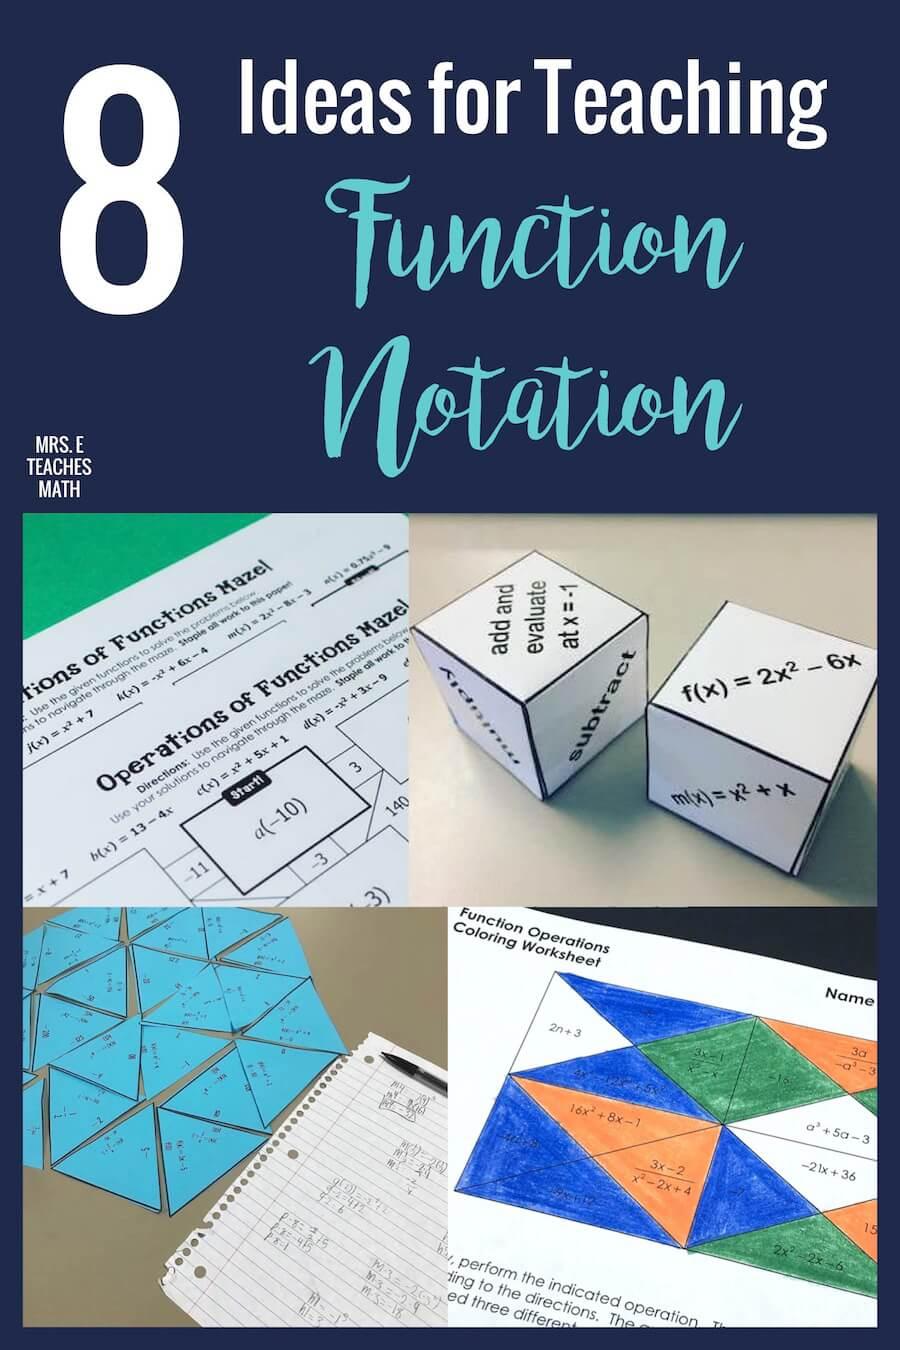 medium resolution of 8 Ideas for Teaching Function Notation   Mrs. E Teaches Math